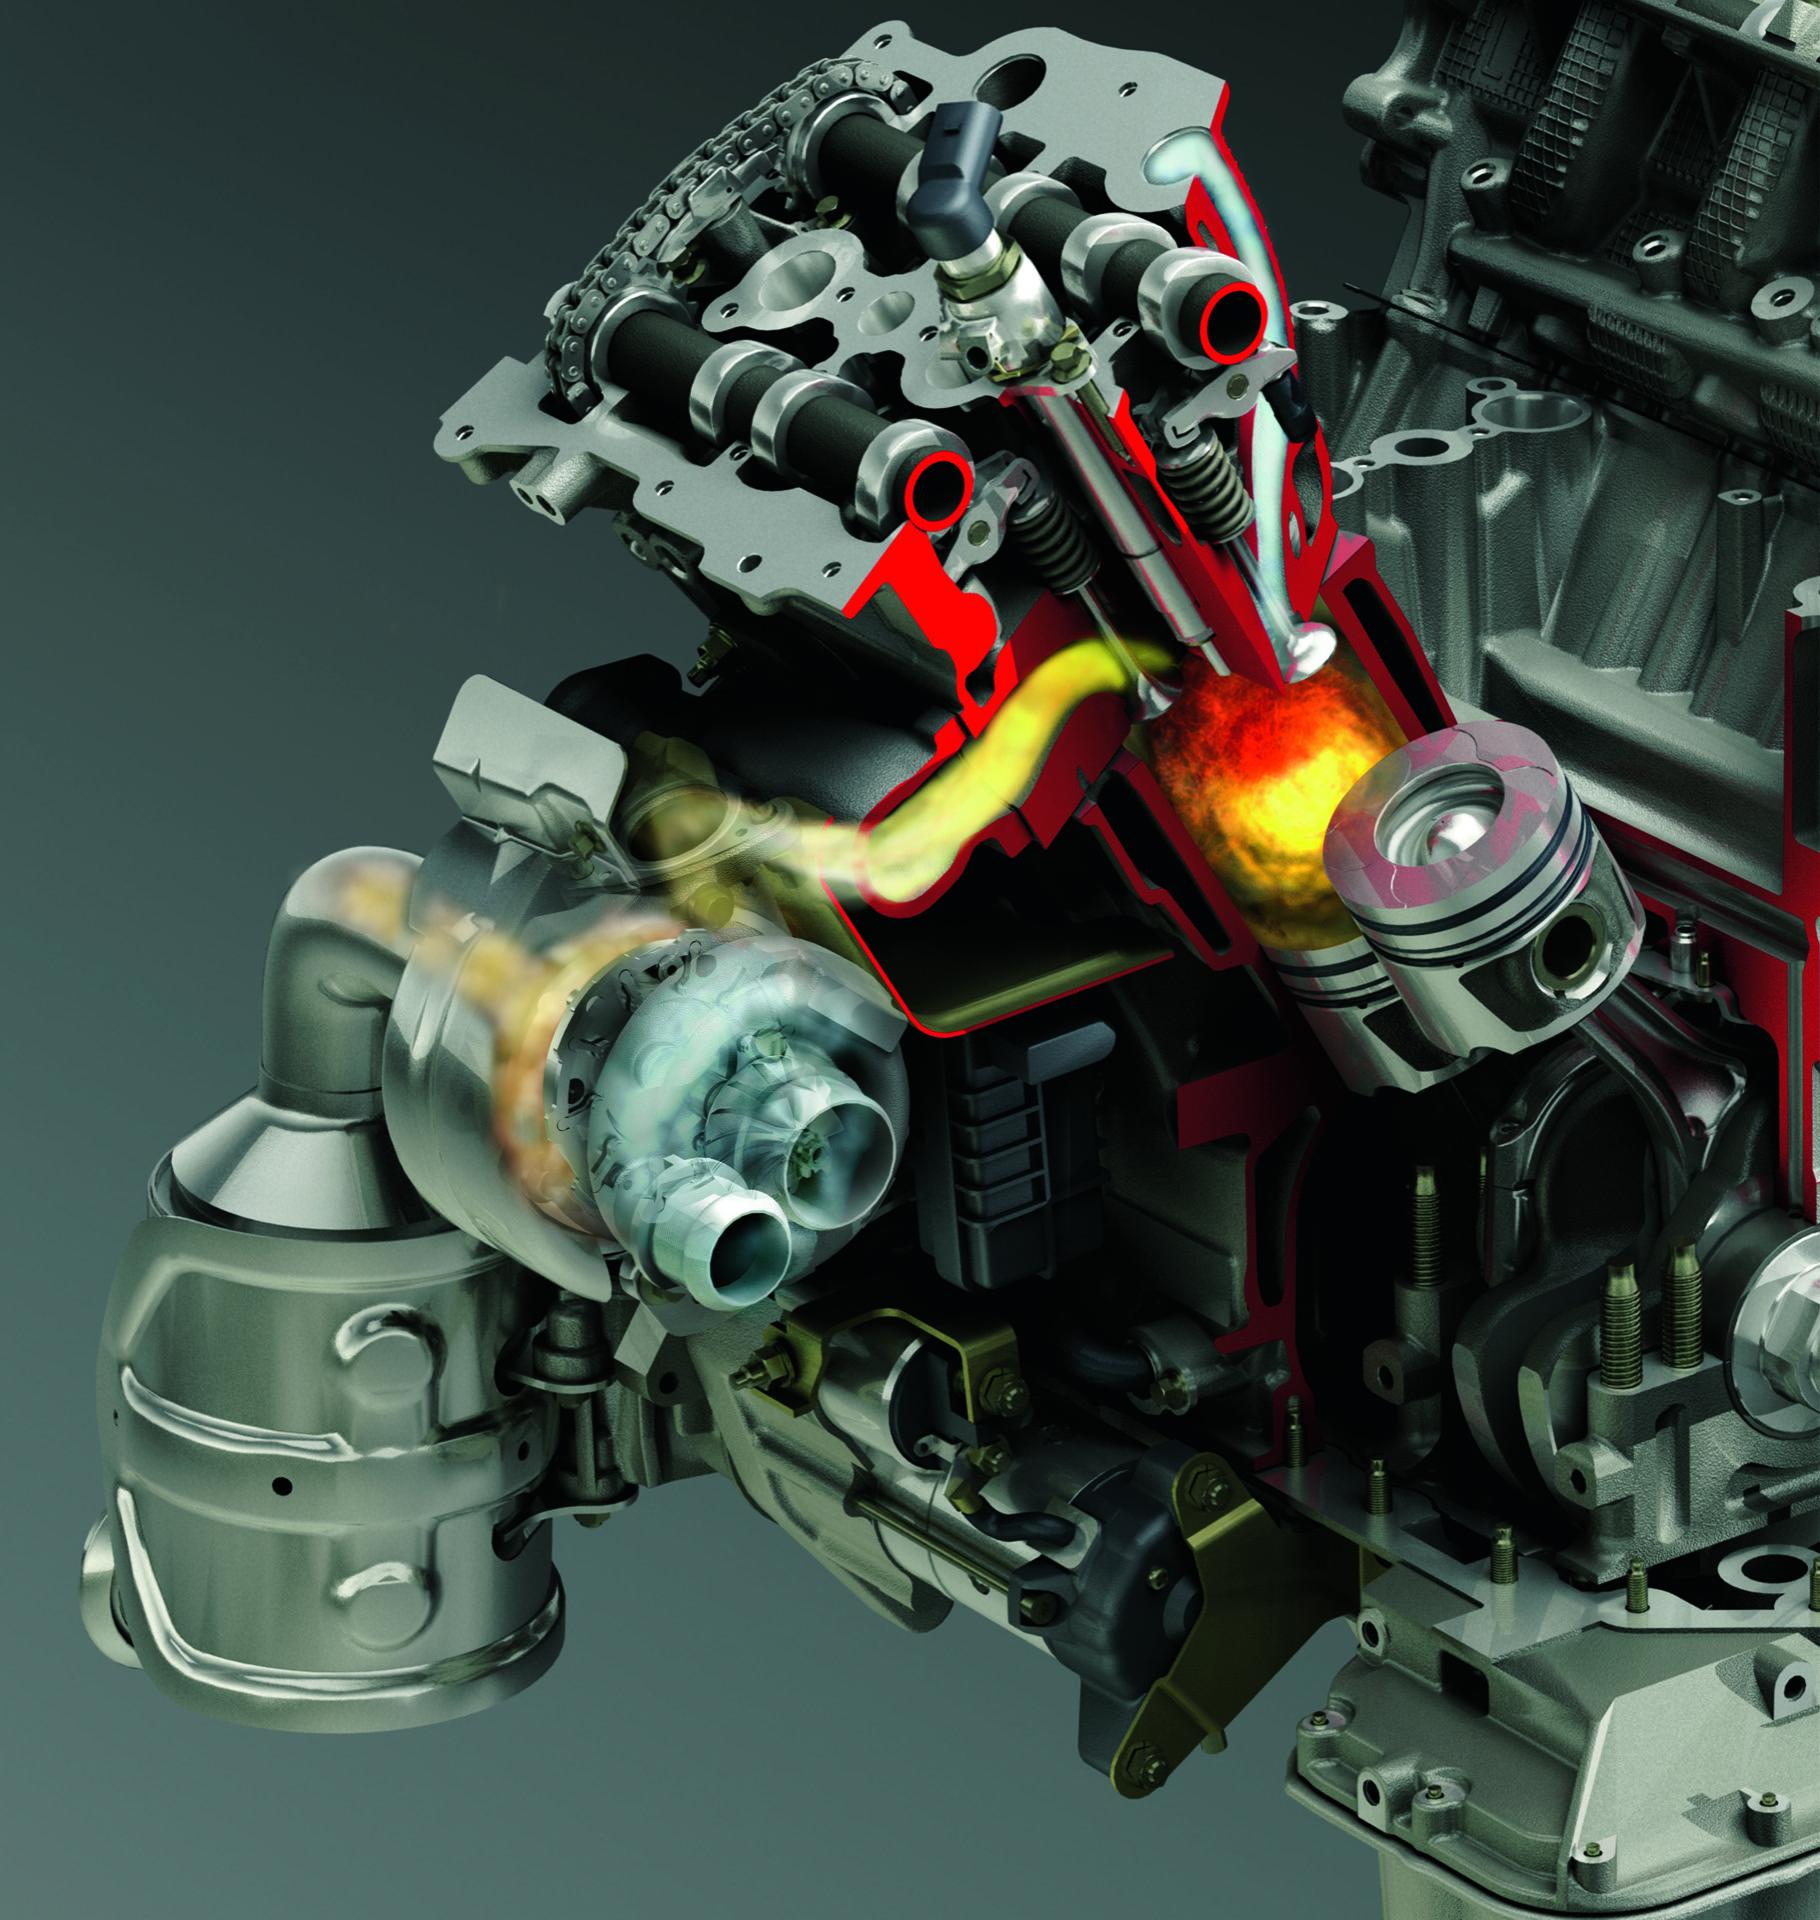 Motor Mecanica11